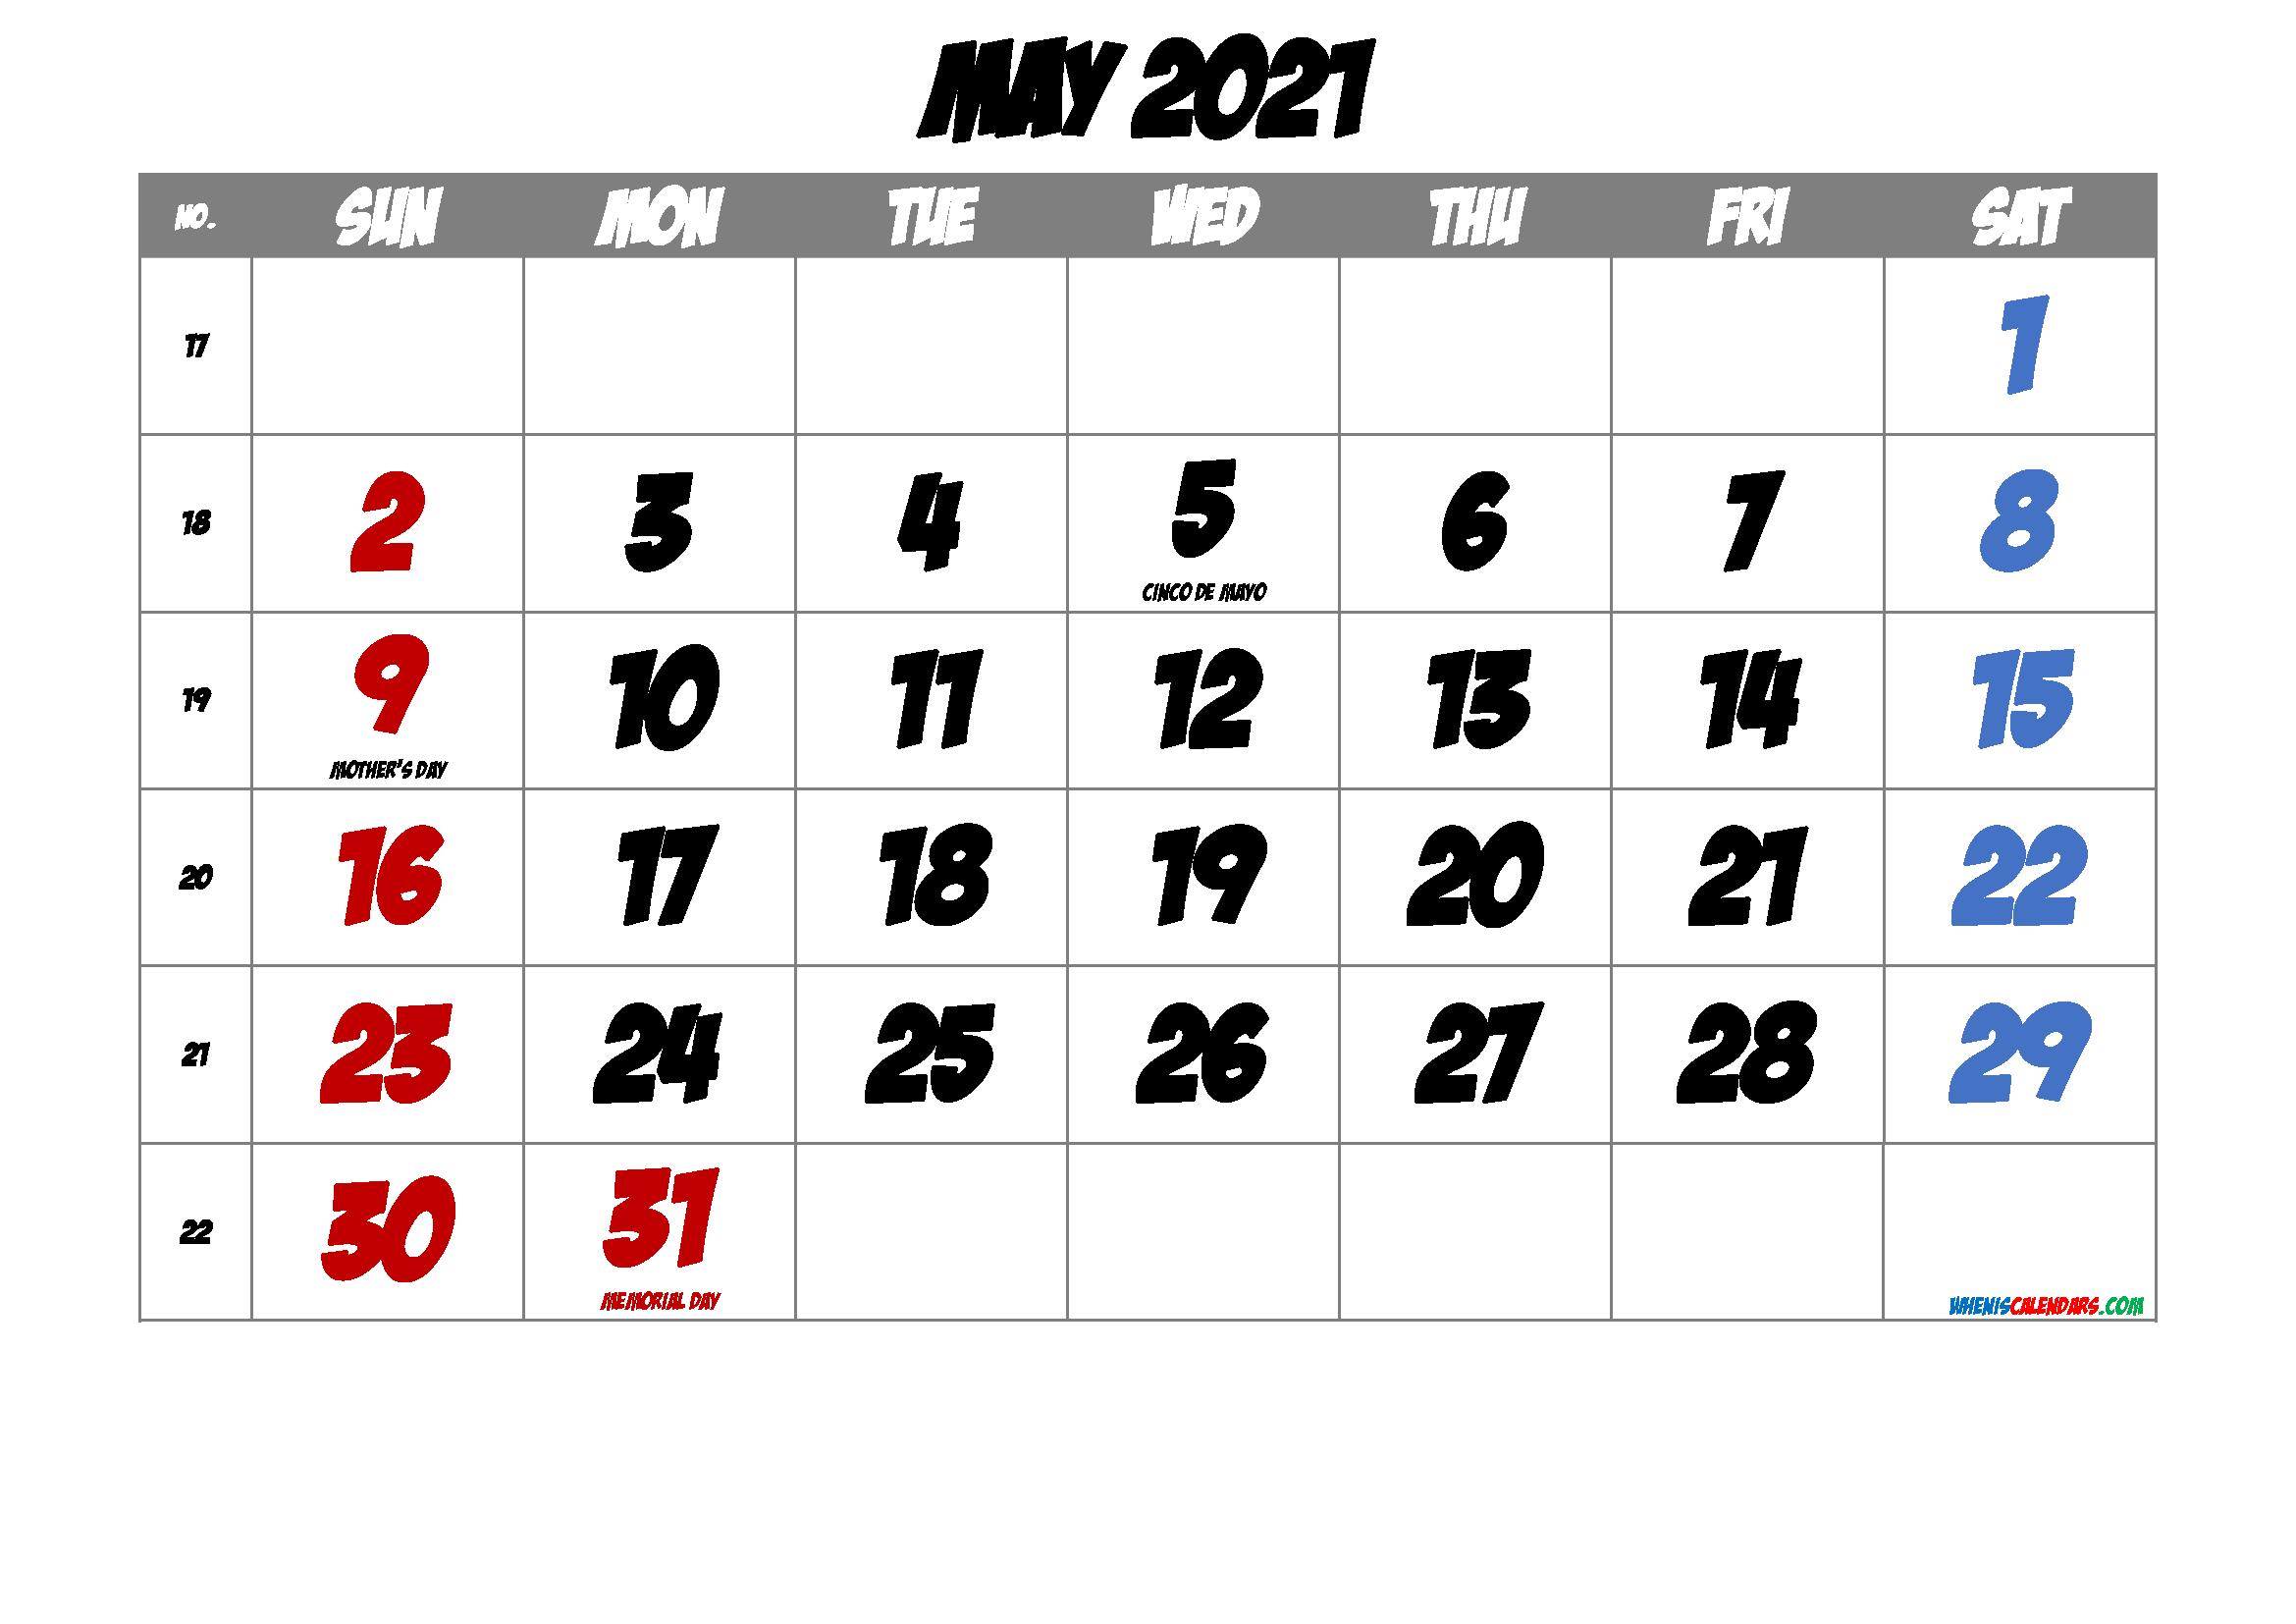 May 2021 Printable Calendar with Holidays